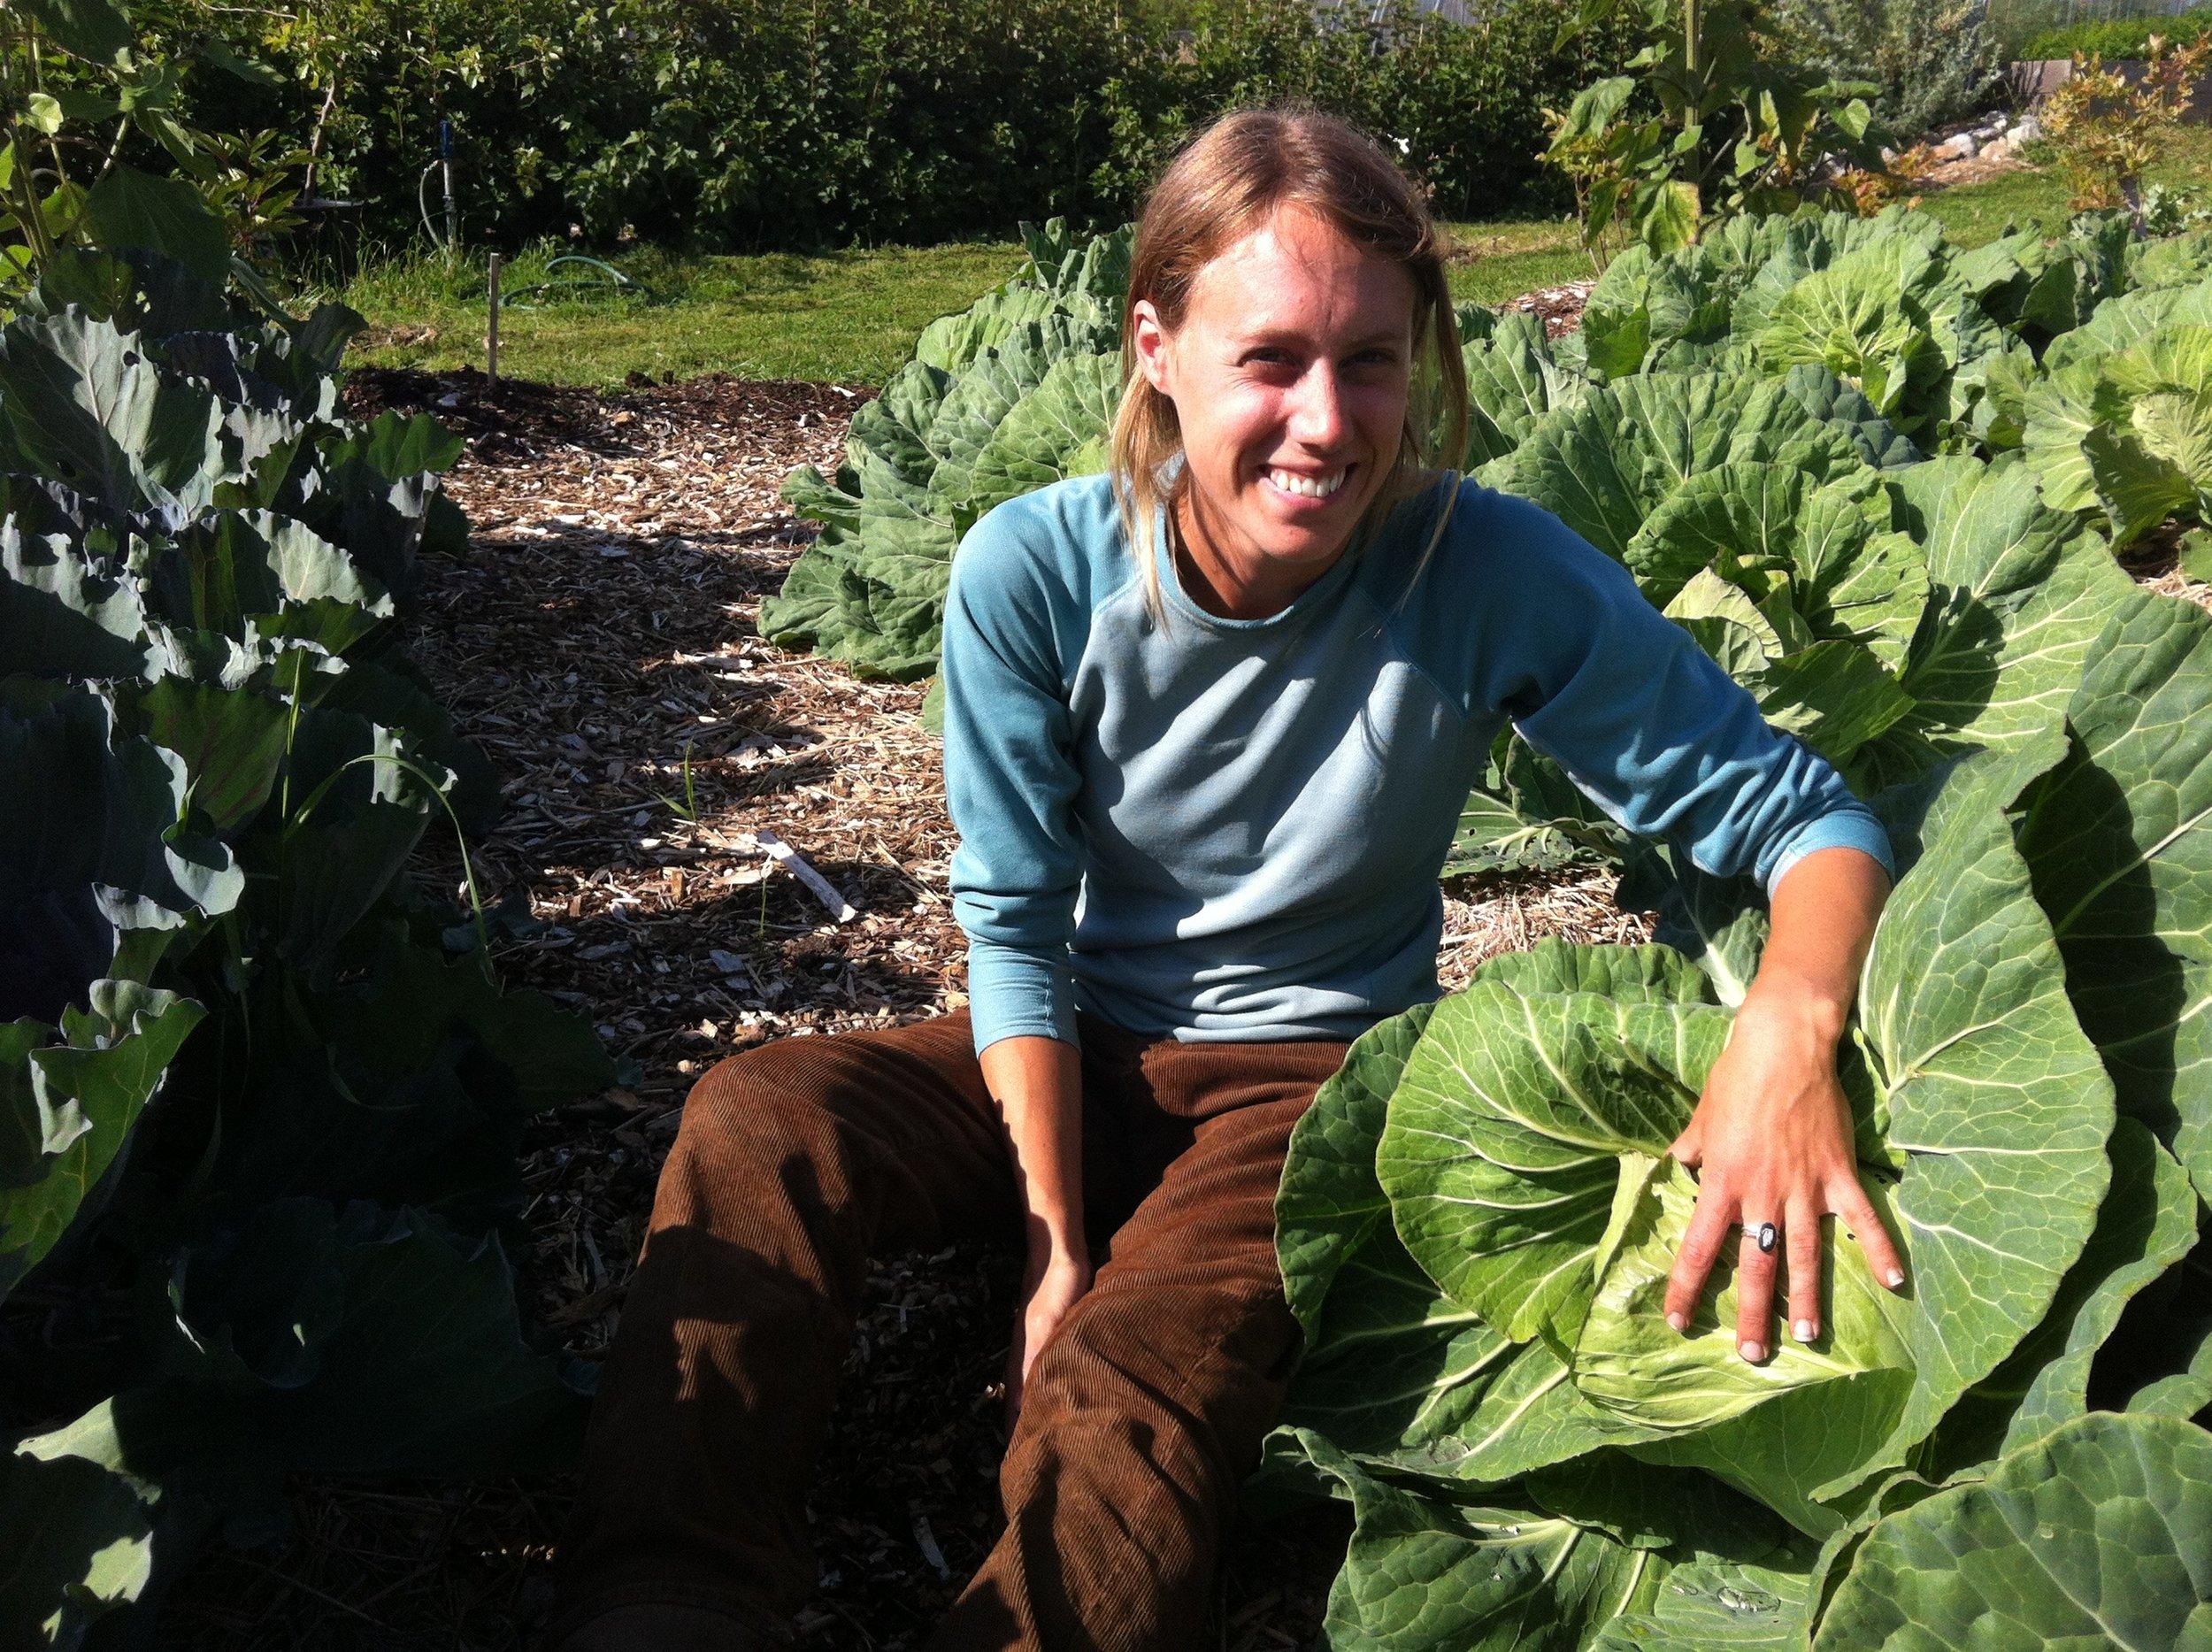 Acadia doing some regenerative gardening!